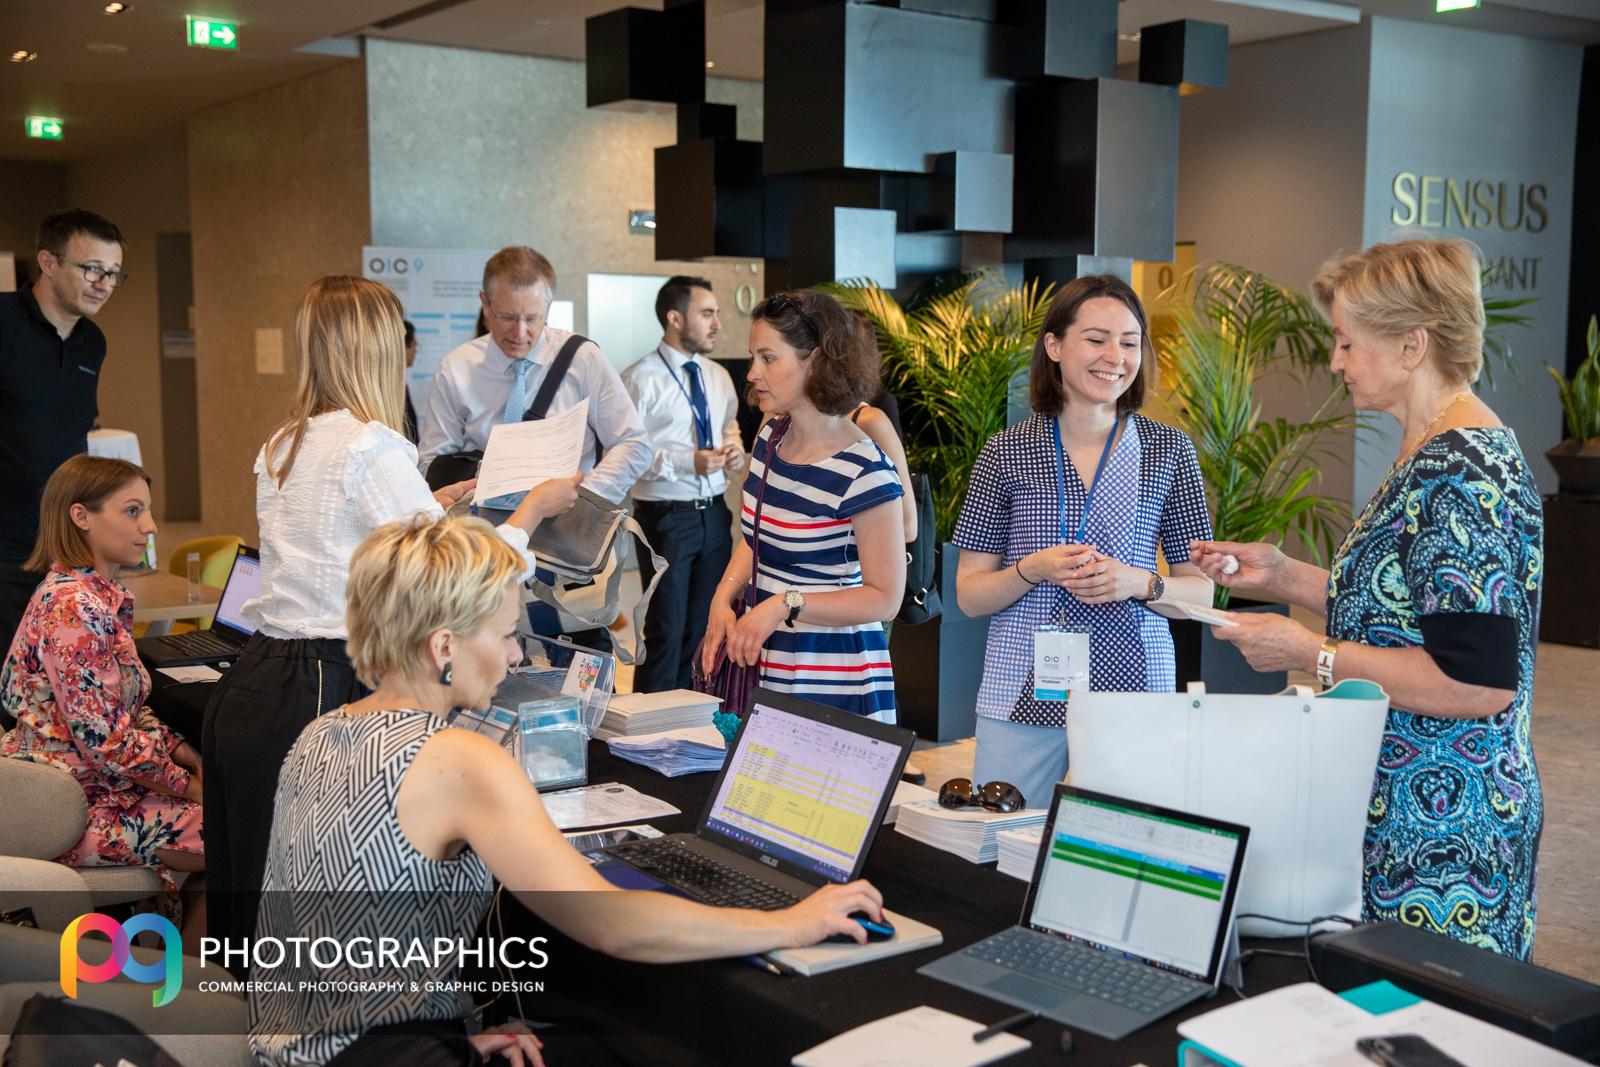 Conference-photography-edinburgh-glasgow-croatia-5.jpg